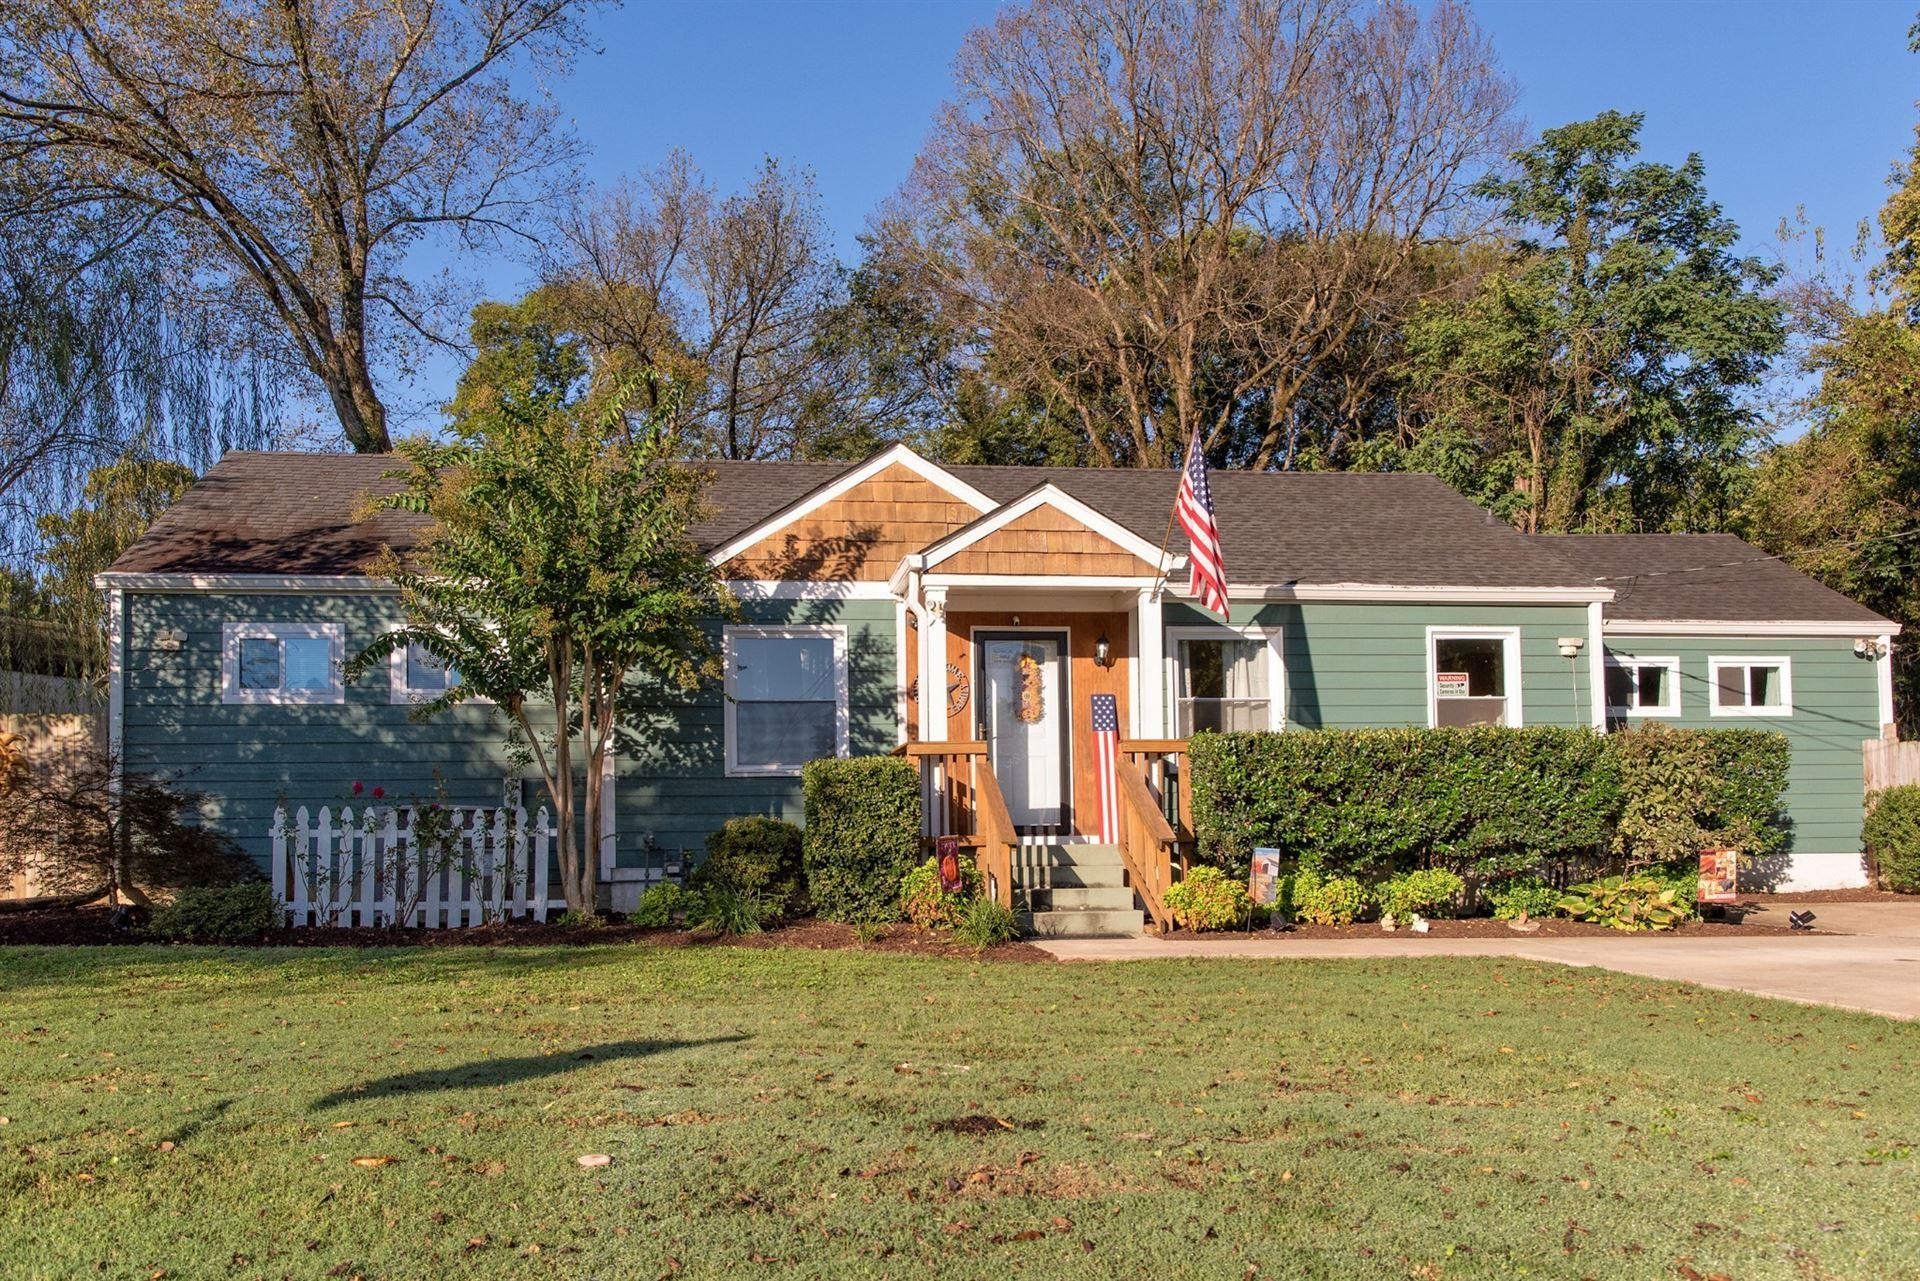 1602 Riverwood Dr, Nashville, TN 37216 - MLS#: 2215603